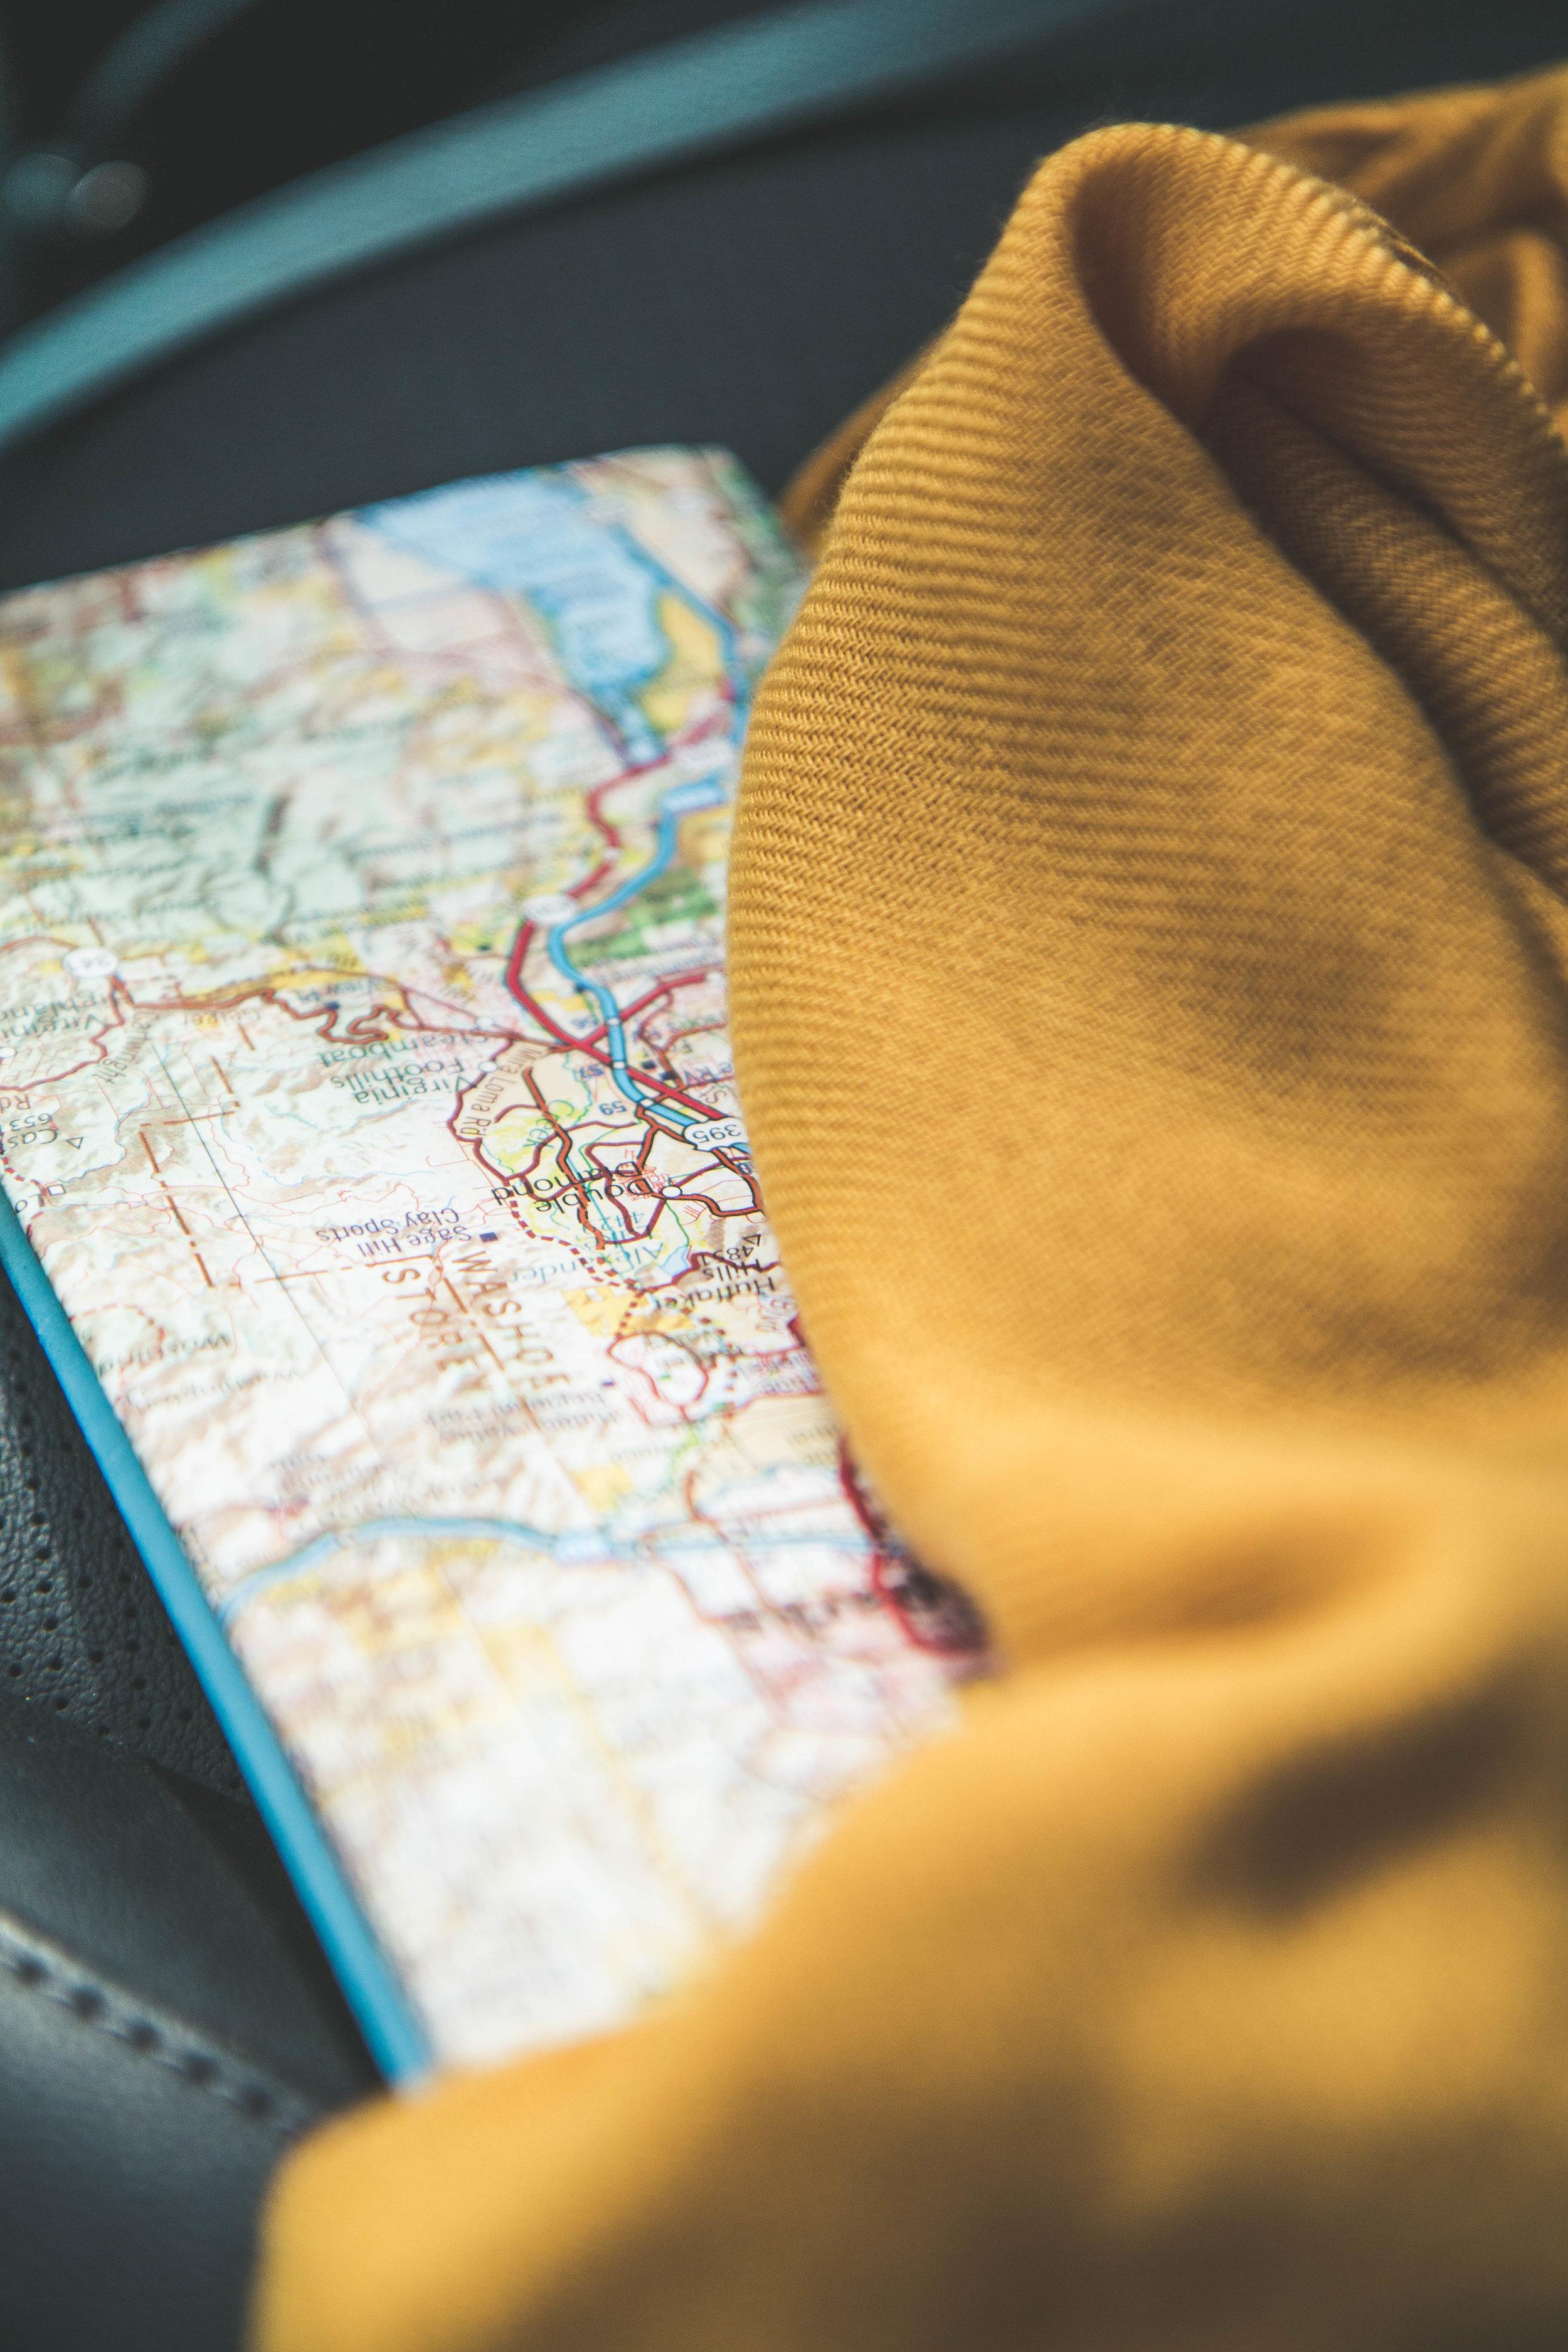 Amazing travel guides my lifestyle + travel blogger Bri Sul